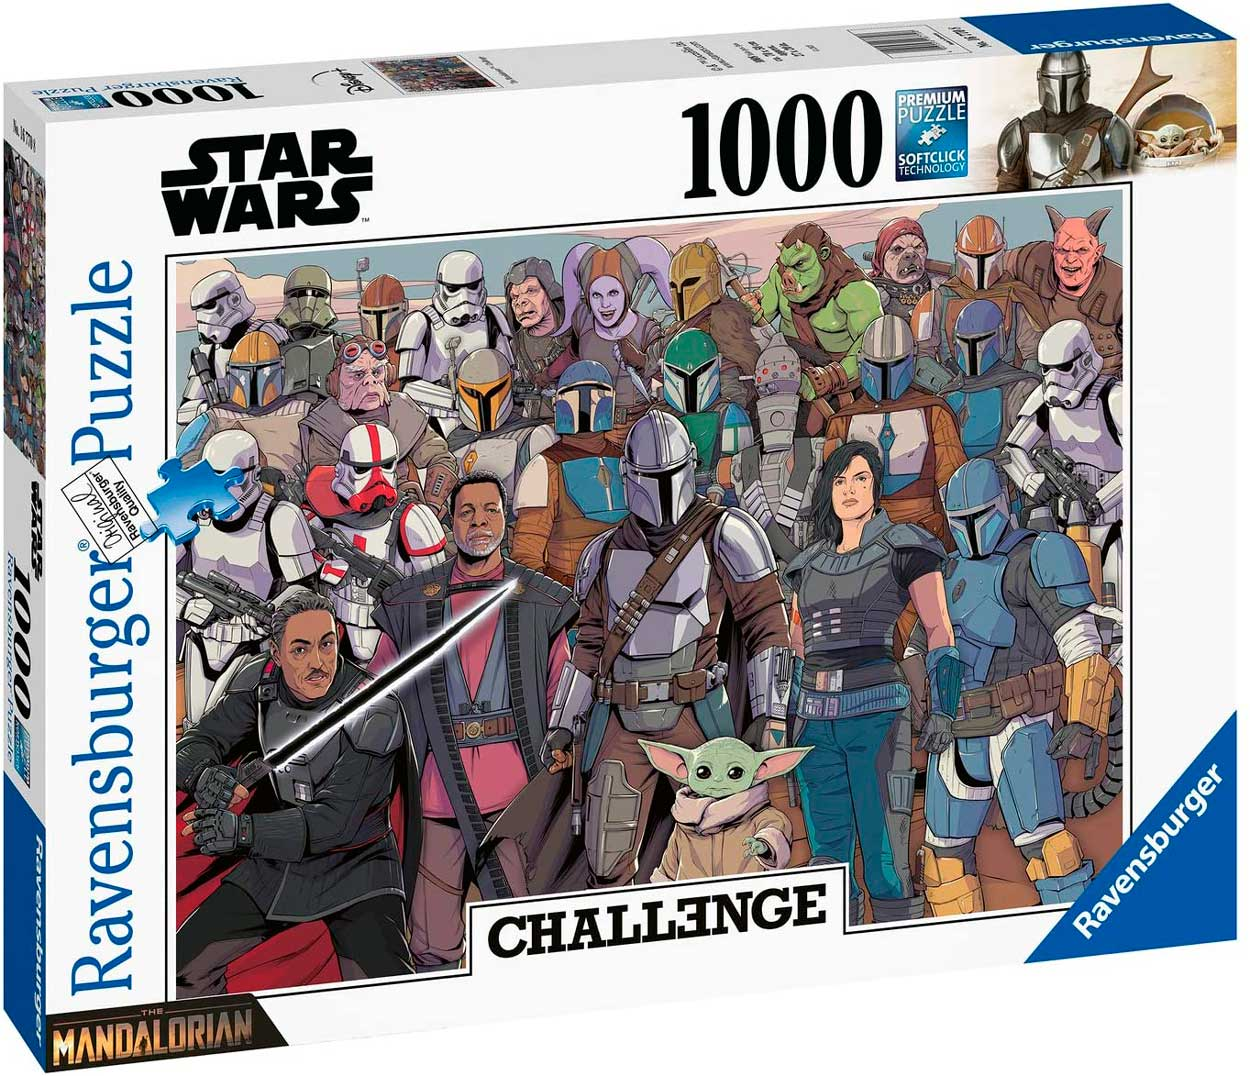 Puzzle Ravensburger Star Wars Baby Yoda Challenge de 1000 Pzs